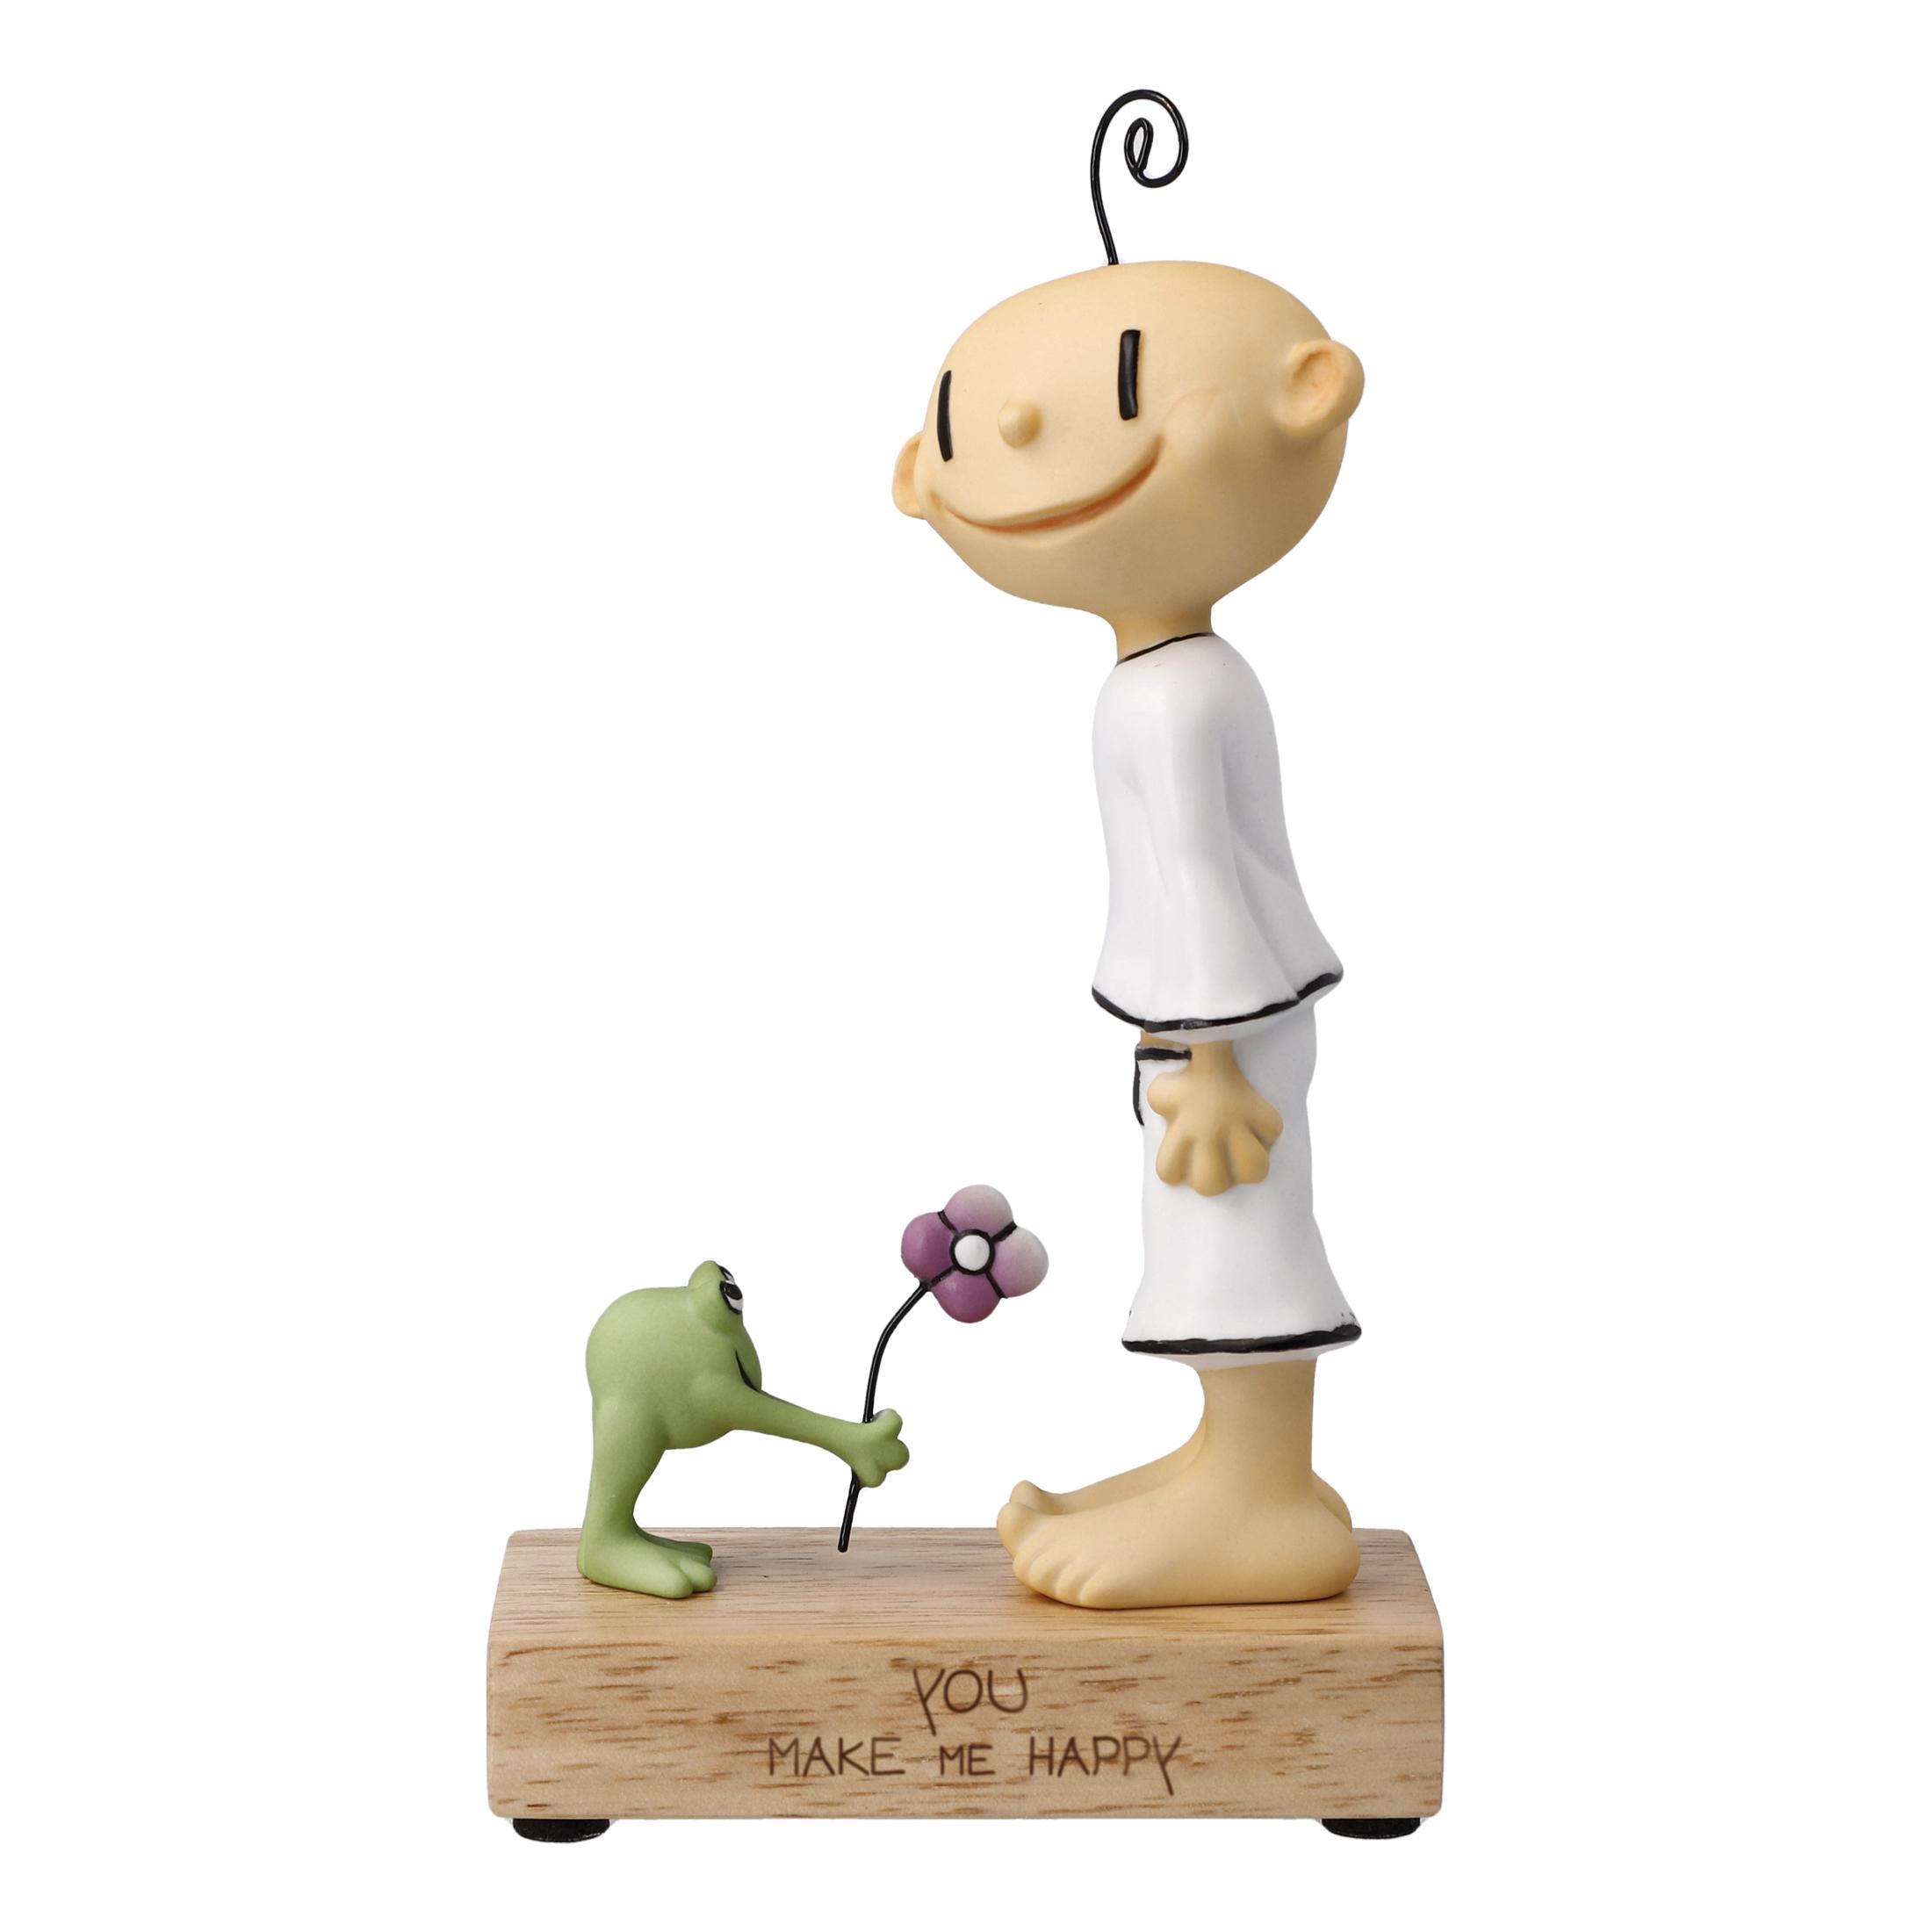 Goebel Der kleine Yogi® Wohnaccessoires 'KY P You make me happy 18,5' 2021 !